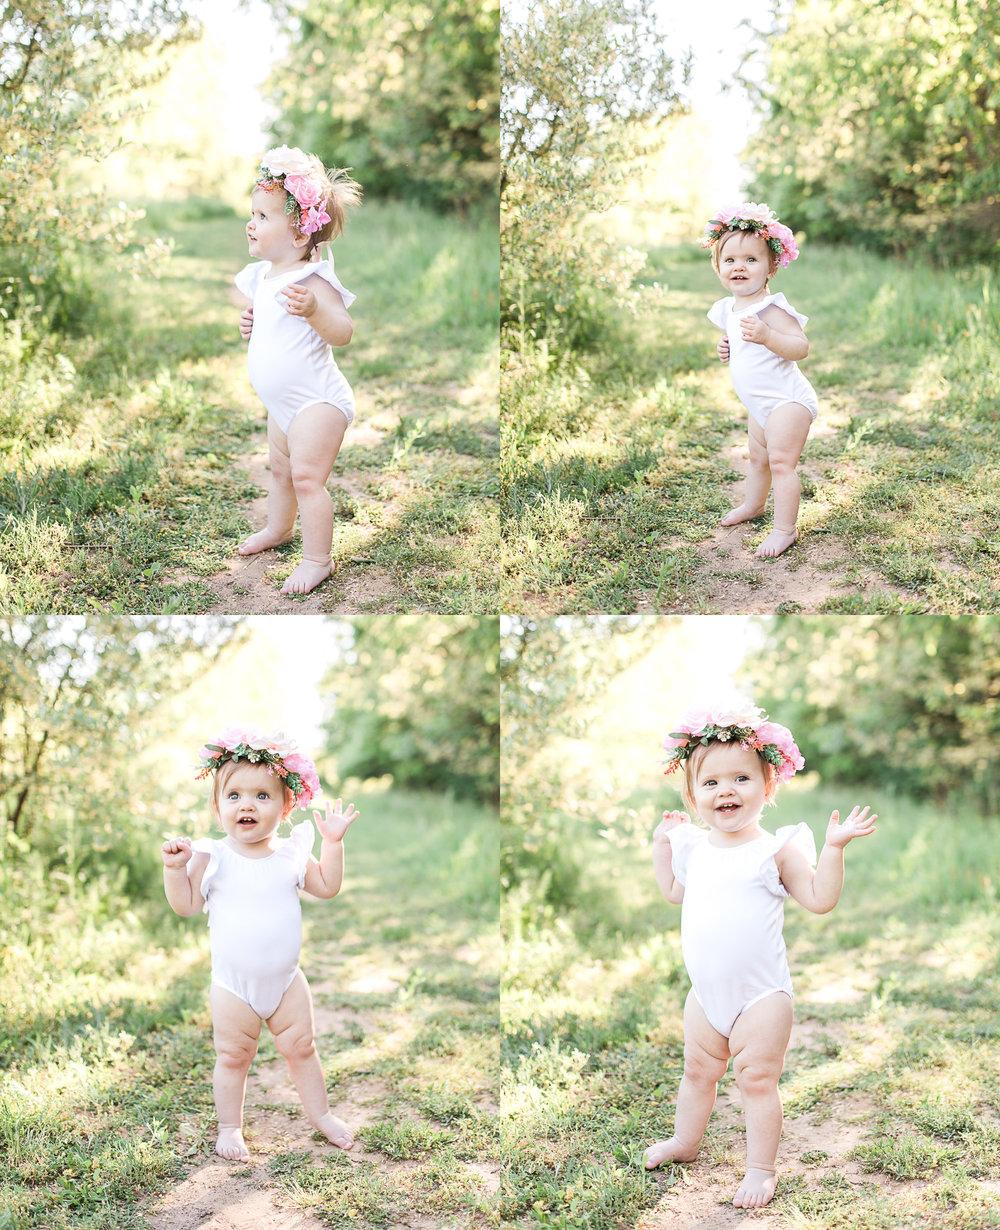 First Birthday Photos | Baby girl | Pink tutu | Cake Smash | Family Photos | Flower crown | What to Wear | Intersex Variation